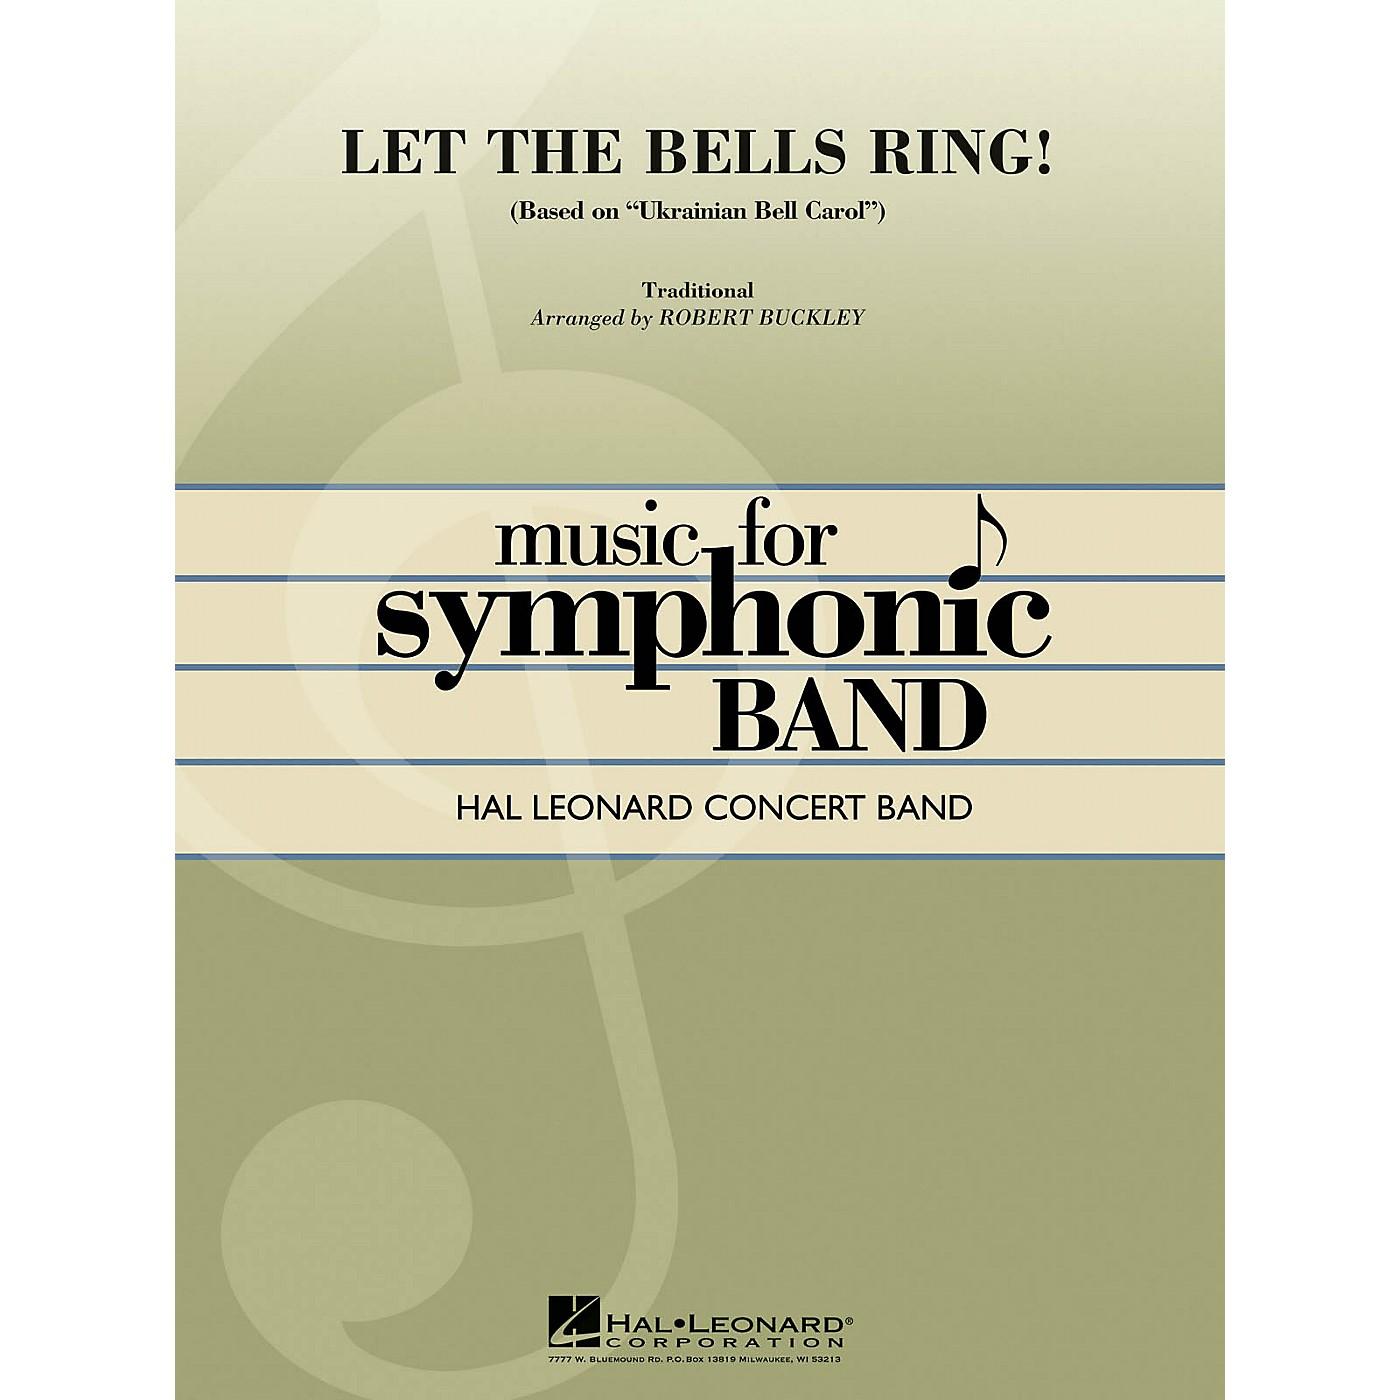 Hal Leonard Let the Bells Ring! (Based on Ukrainian Bell Carol) Concert Band Level 4 Composed by Robert Buckley thumbnail